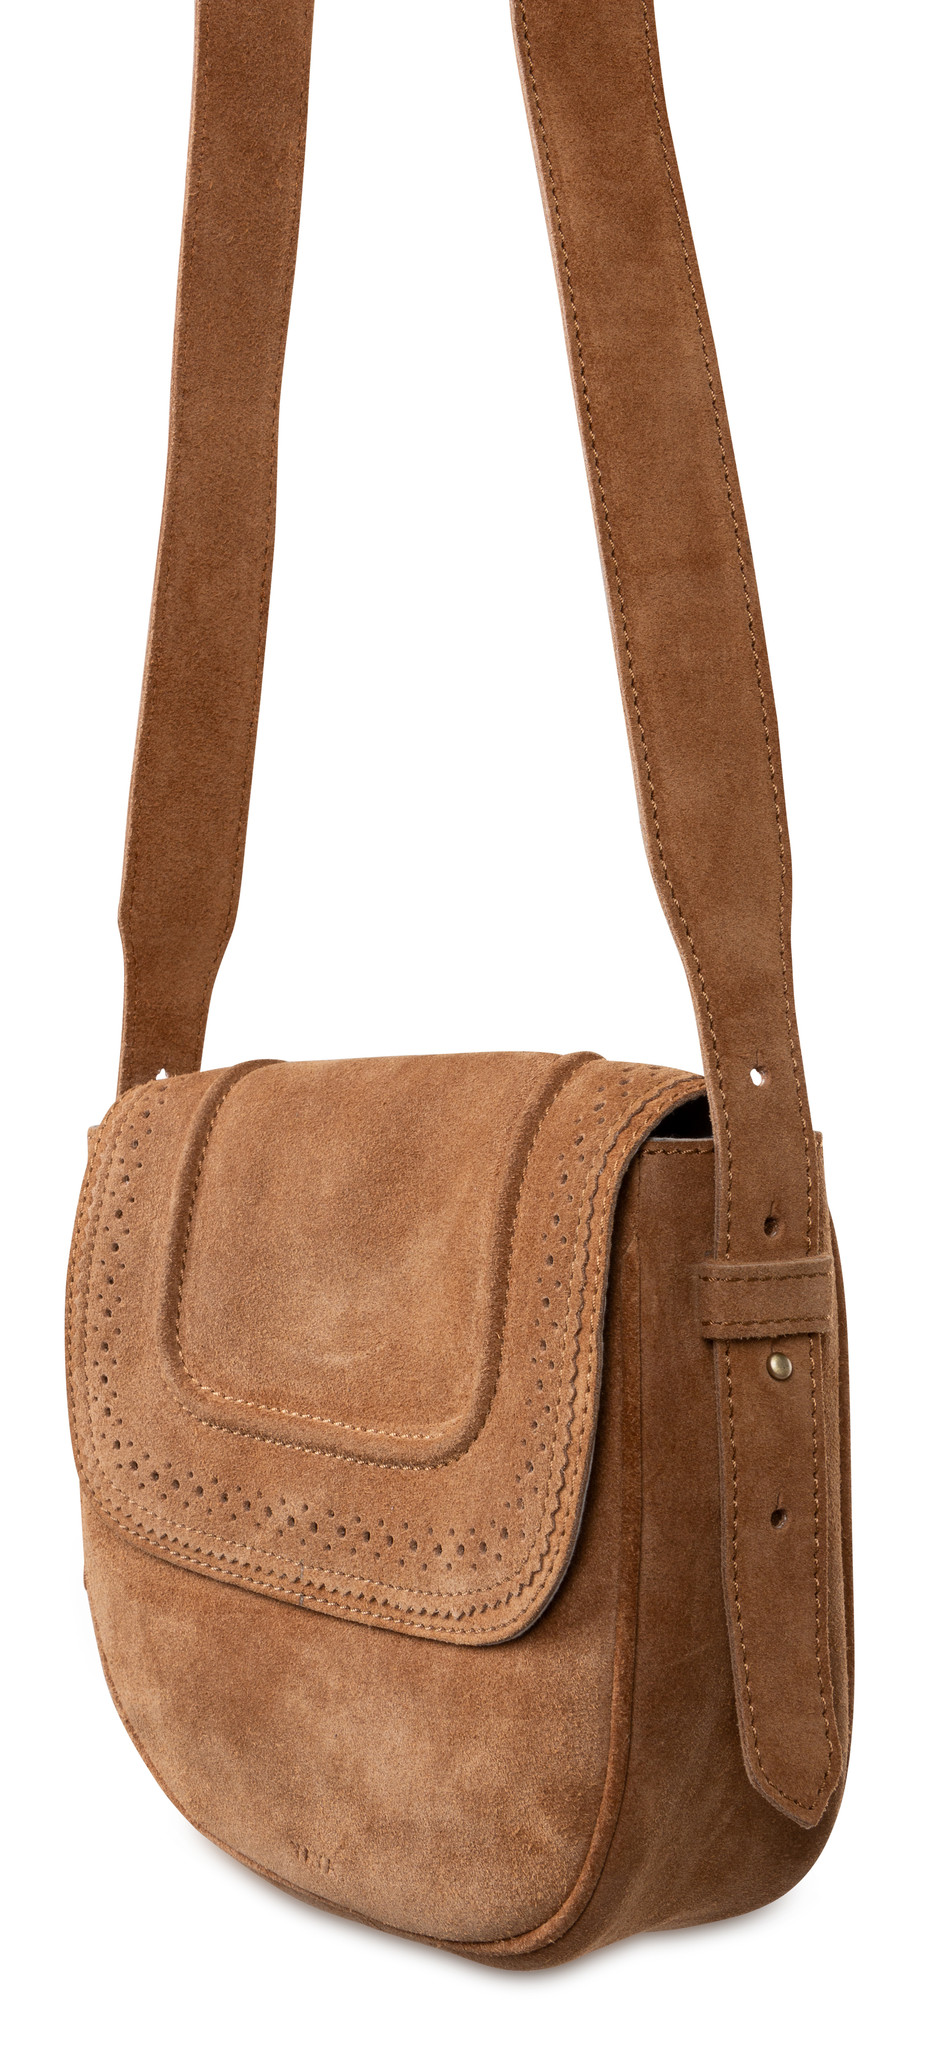 yaya Suede strap bag 131359-014-1